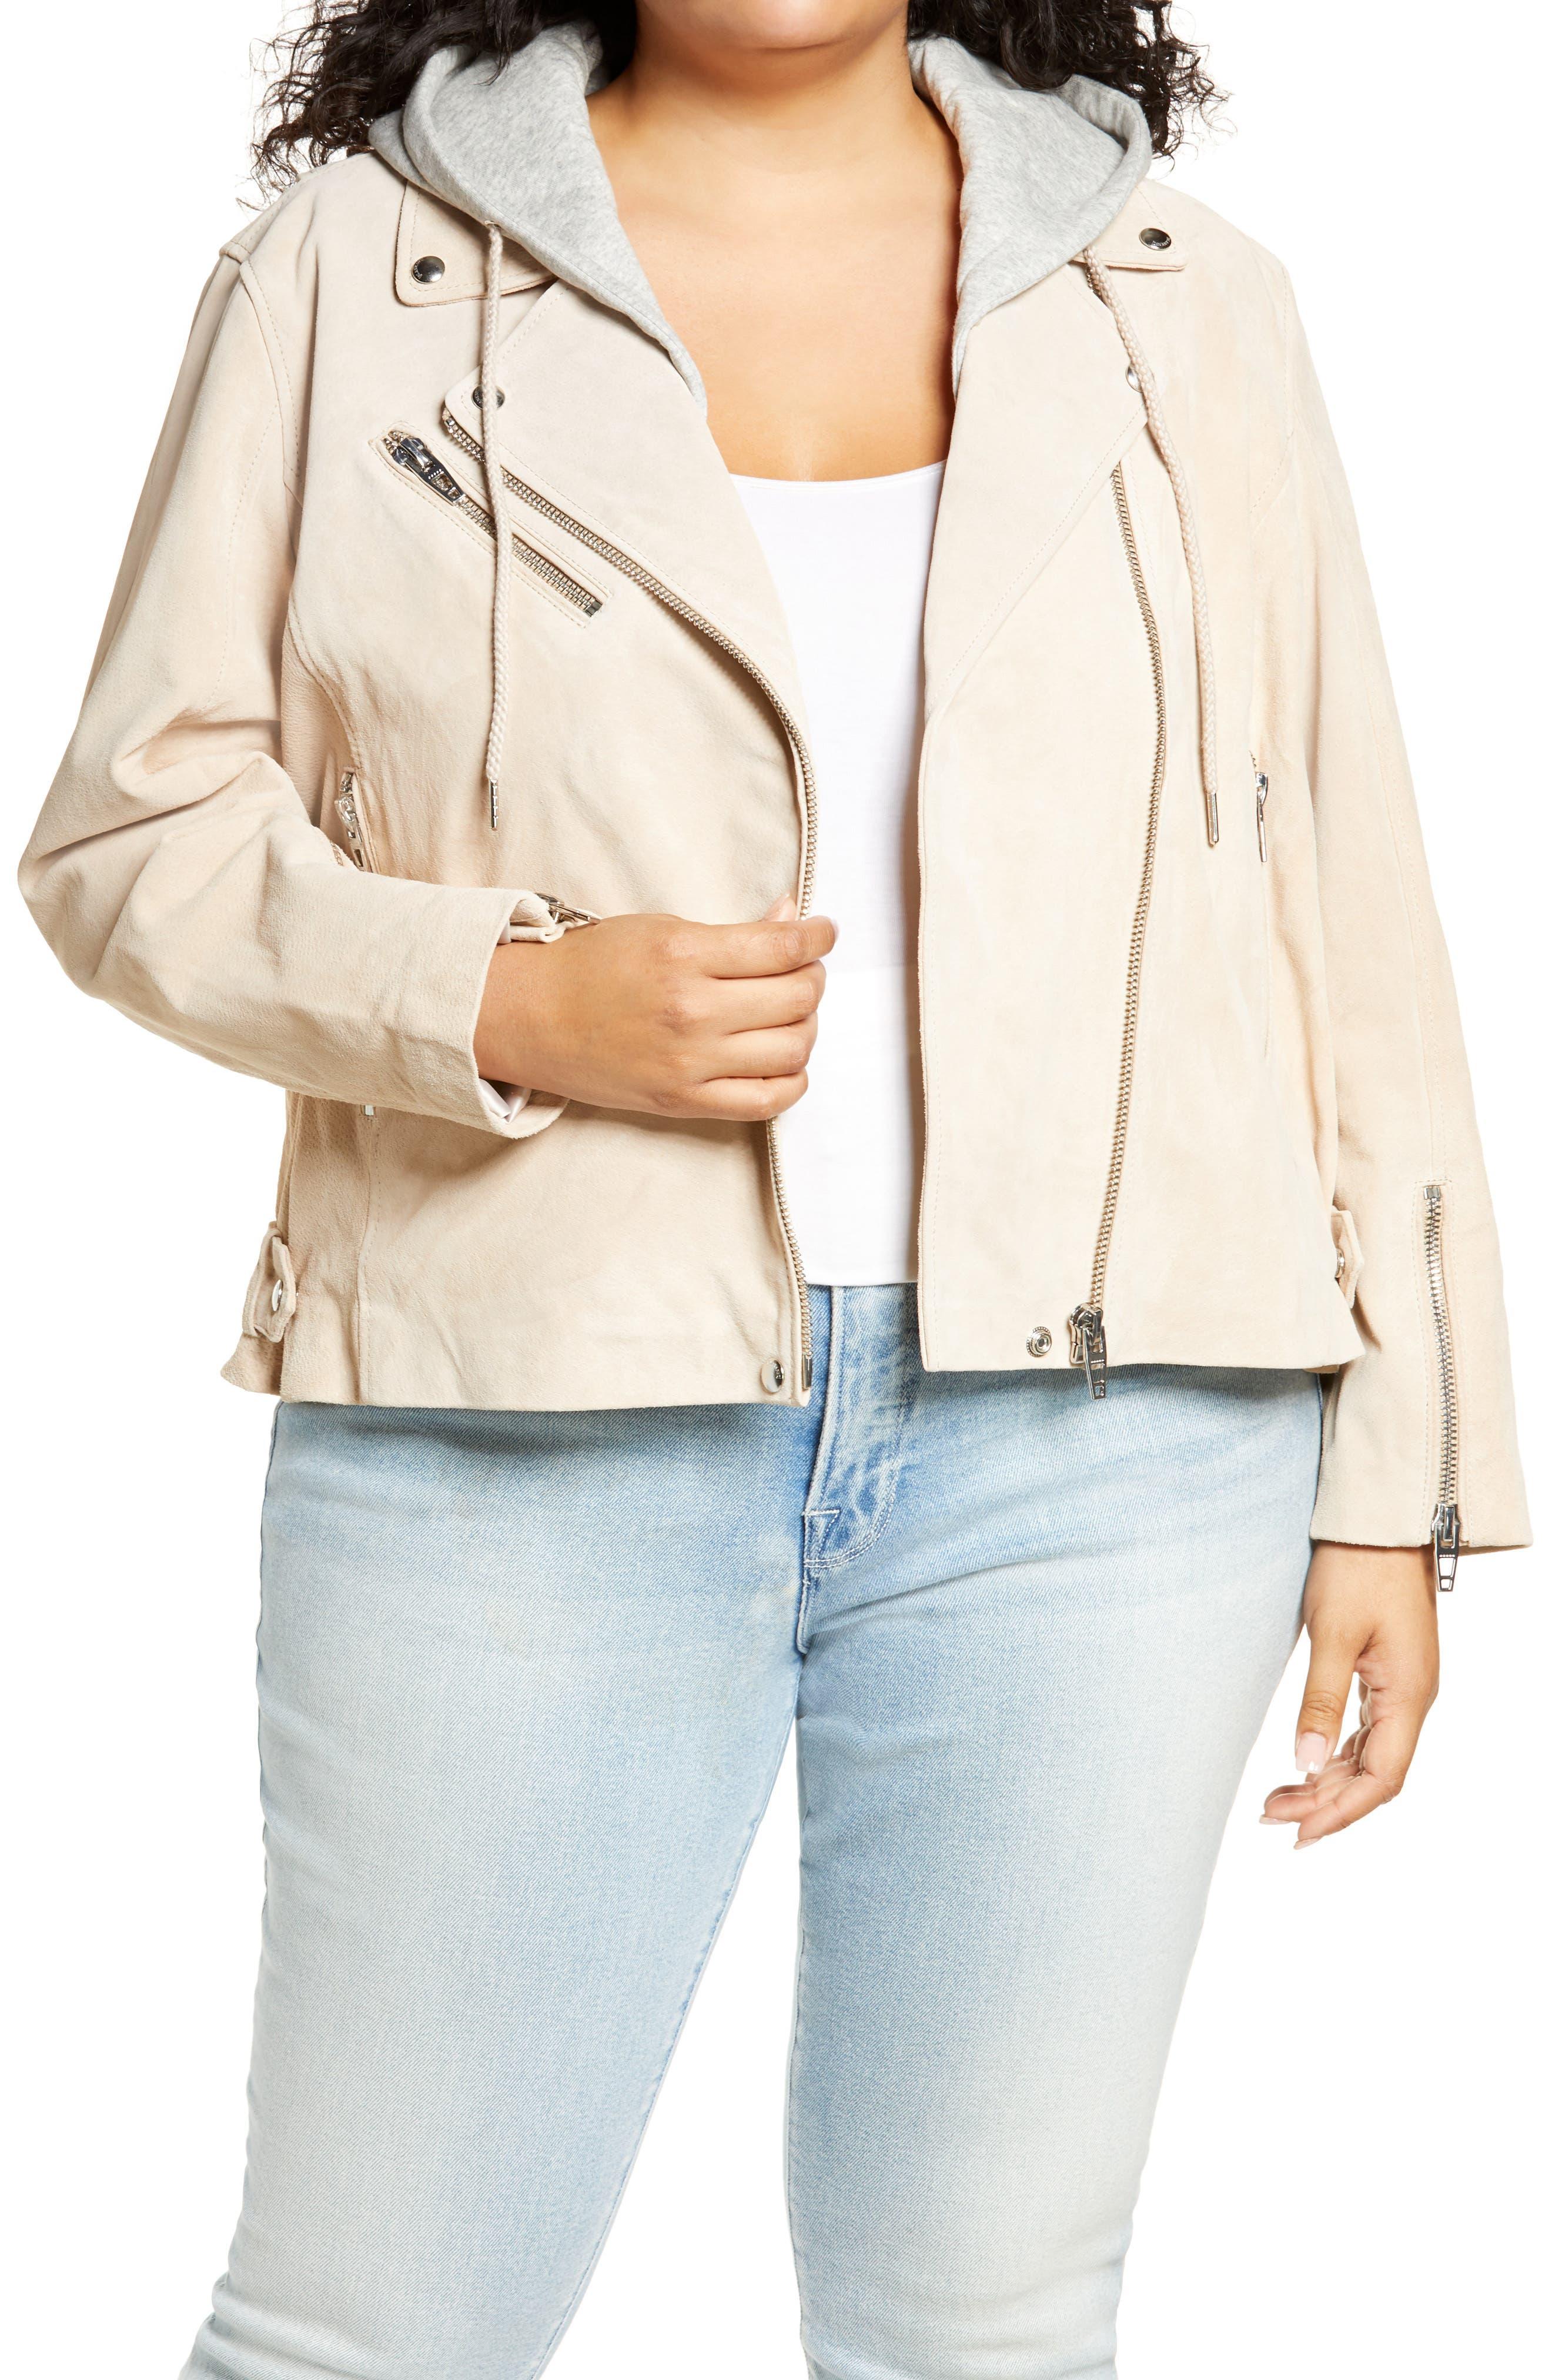 Plus Size Women's Blanknyc Suede Hooded Leather Moto Jacket, Size 2X - White